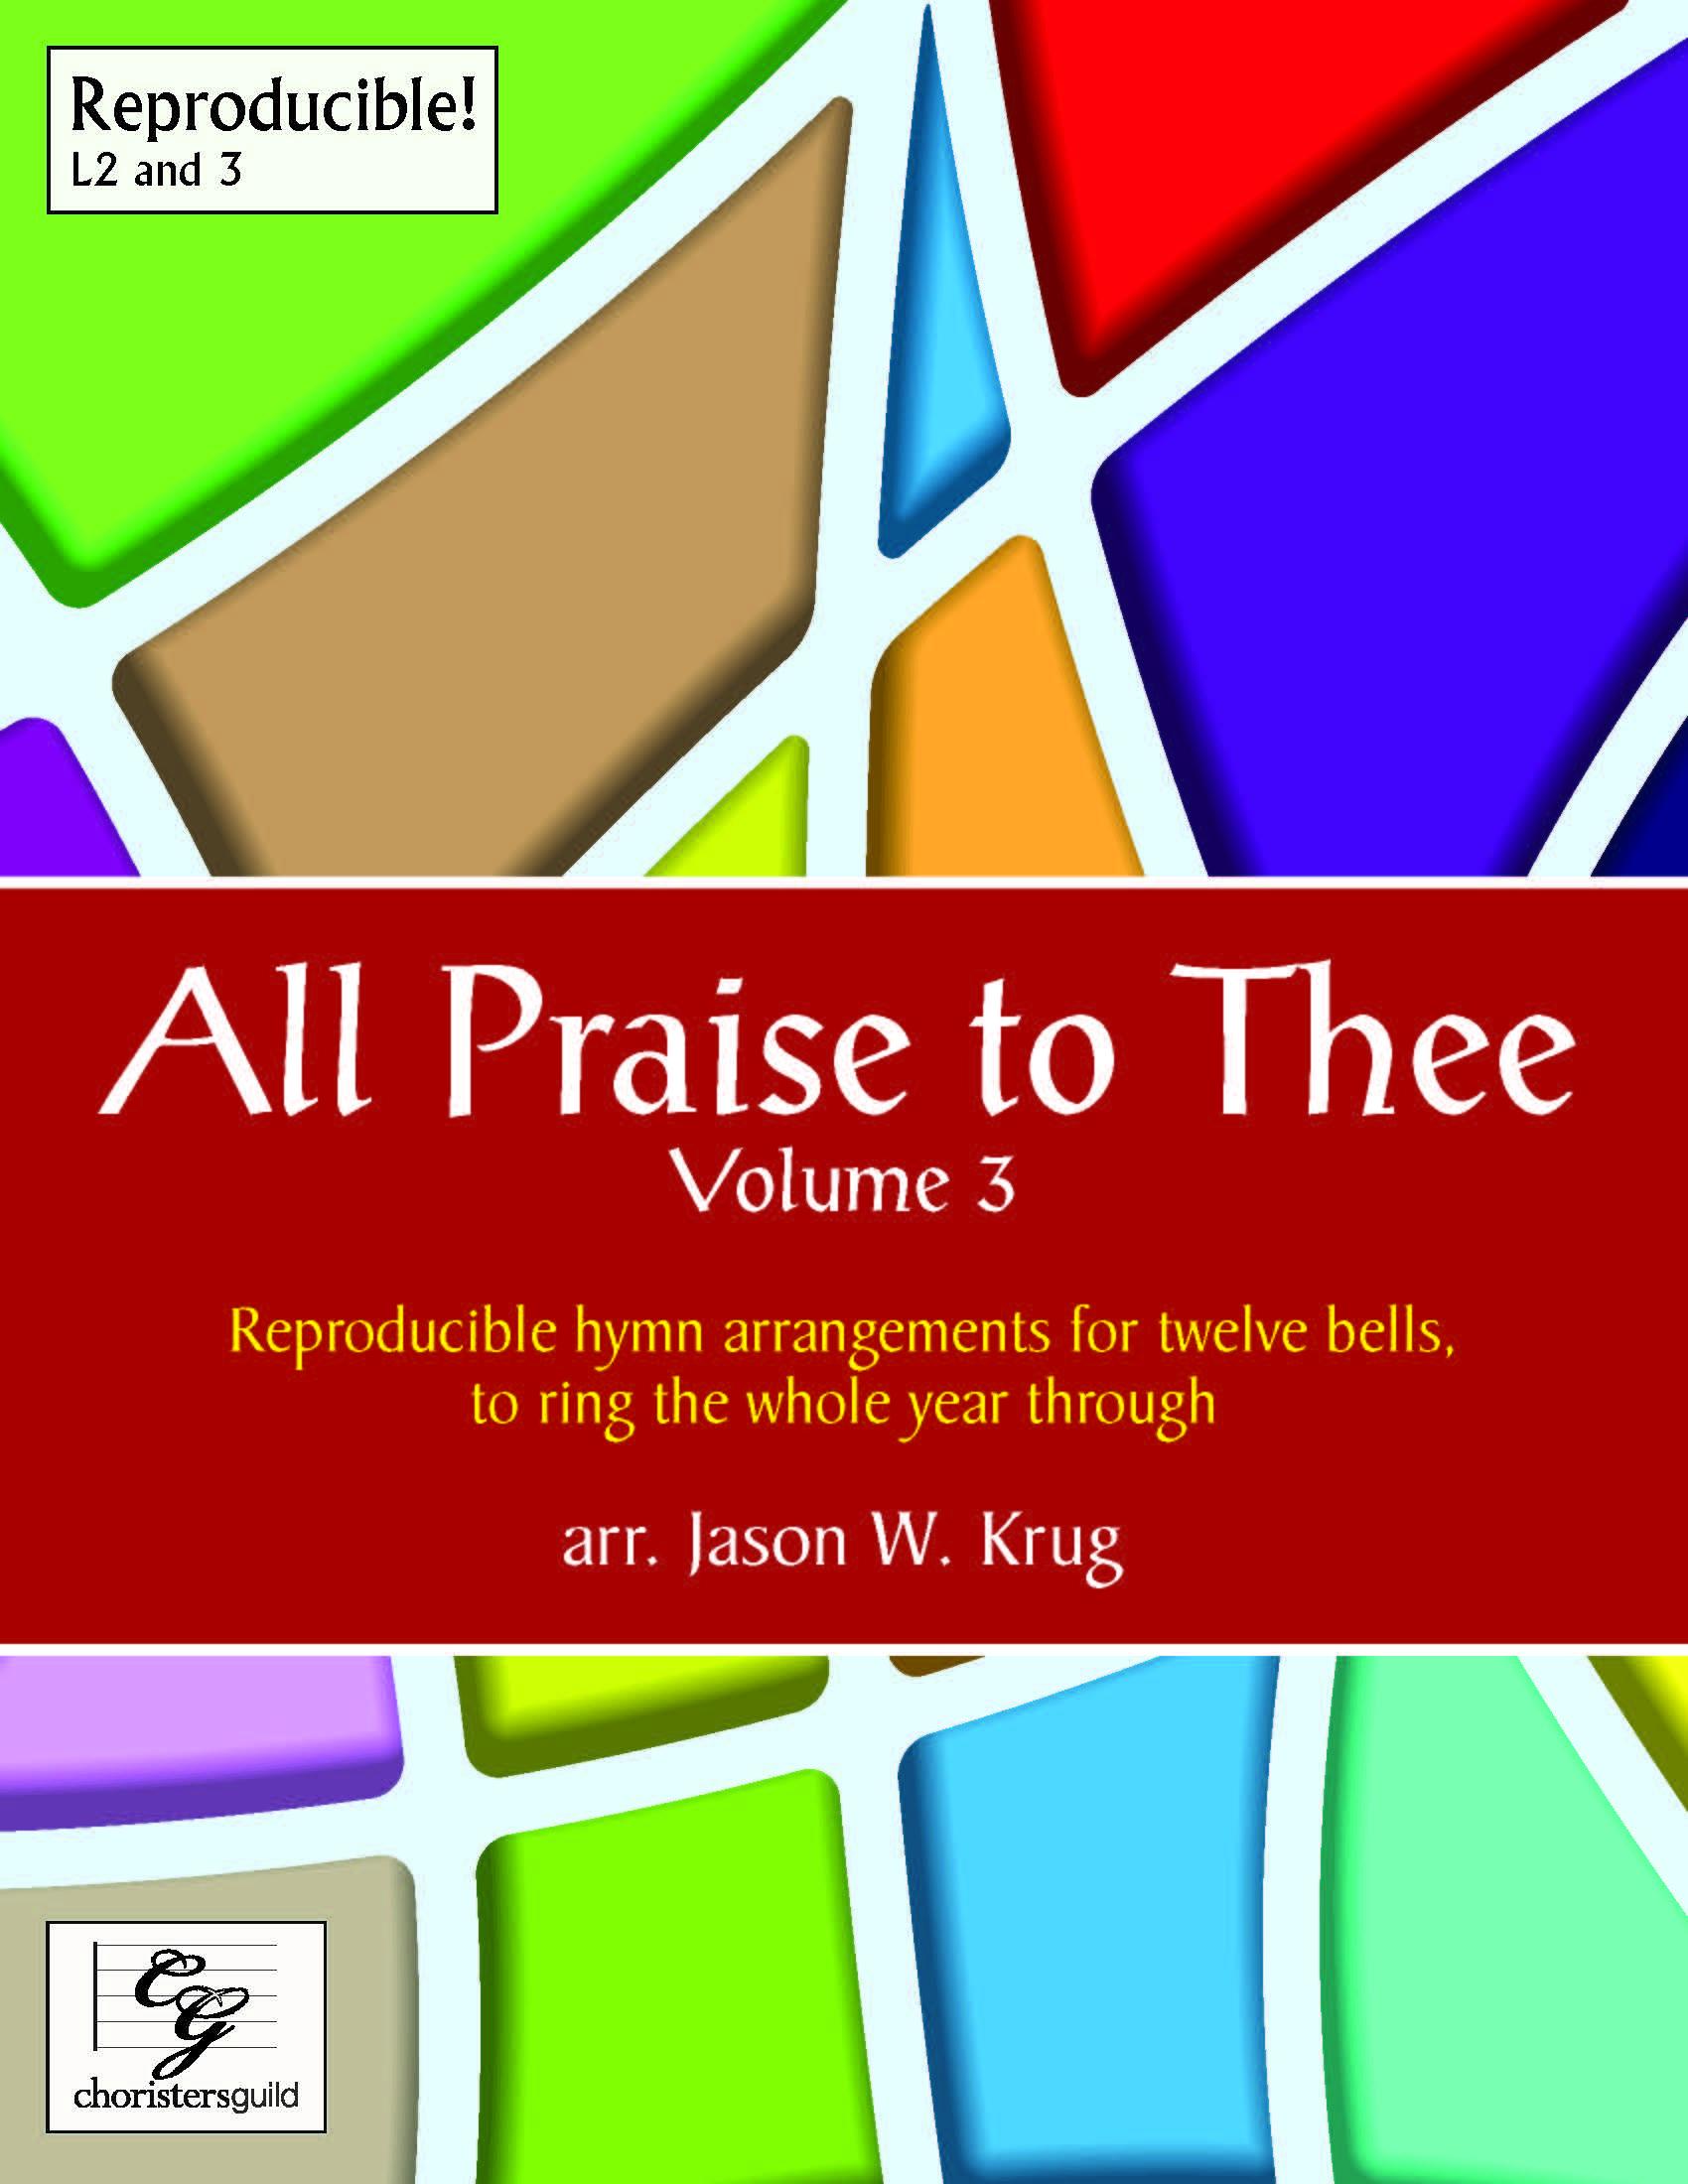 All Praise to Thee, Volume 3 (Digital Score) - 12 bells (F5-C7)